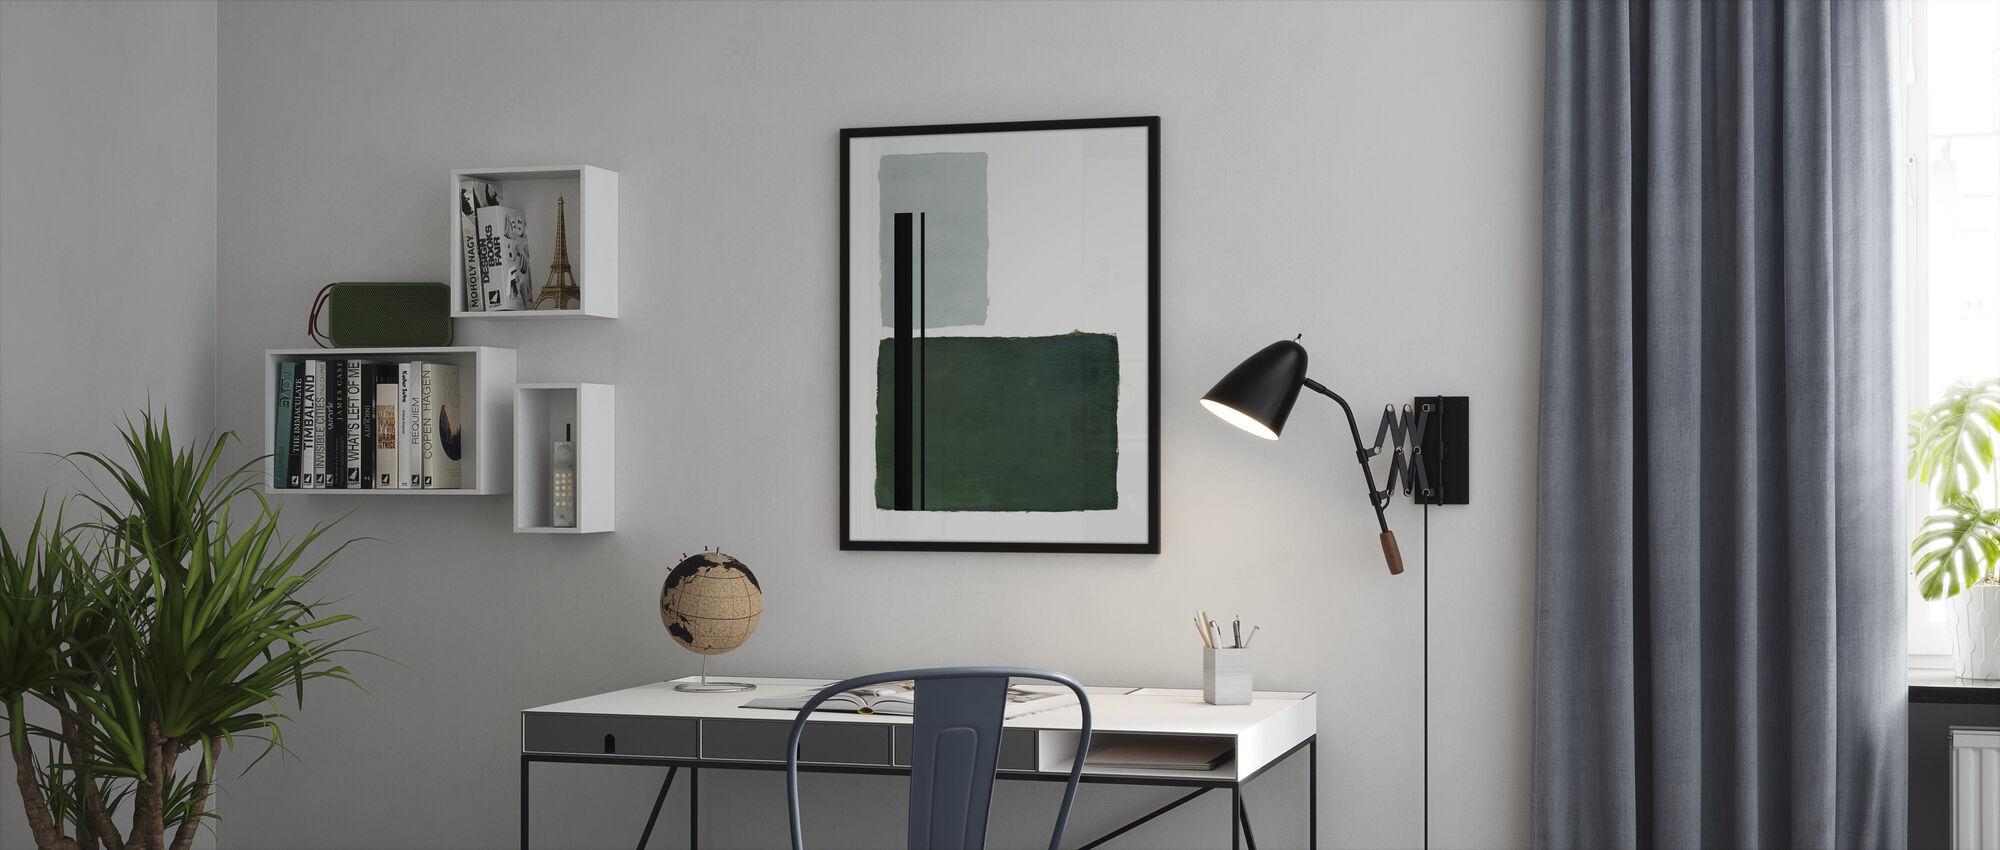 Equilibrium - Framed print - Office